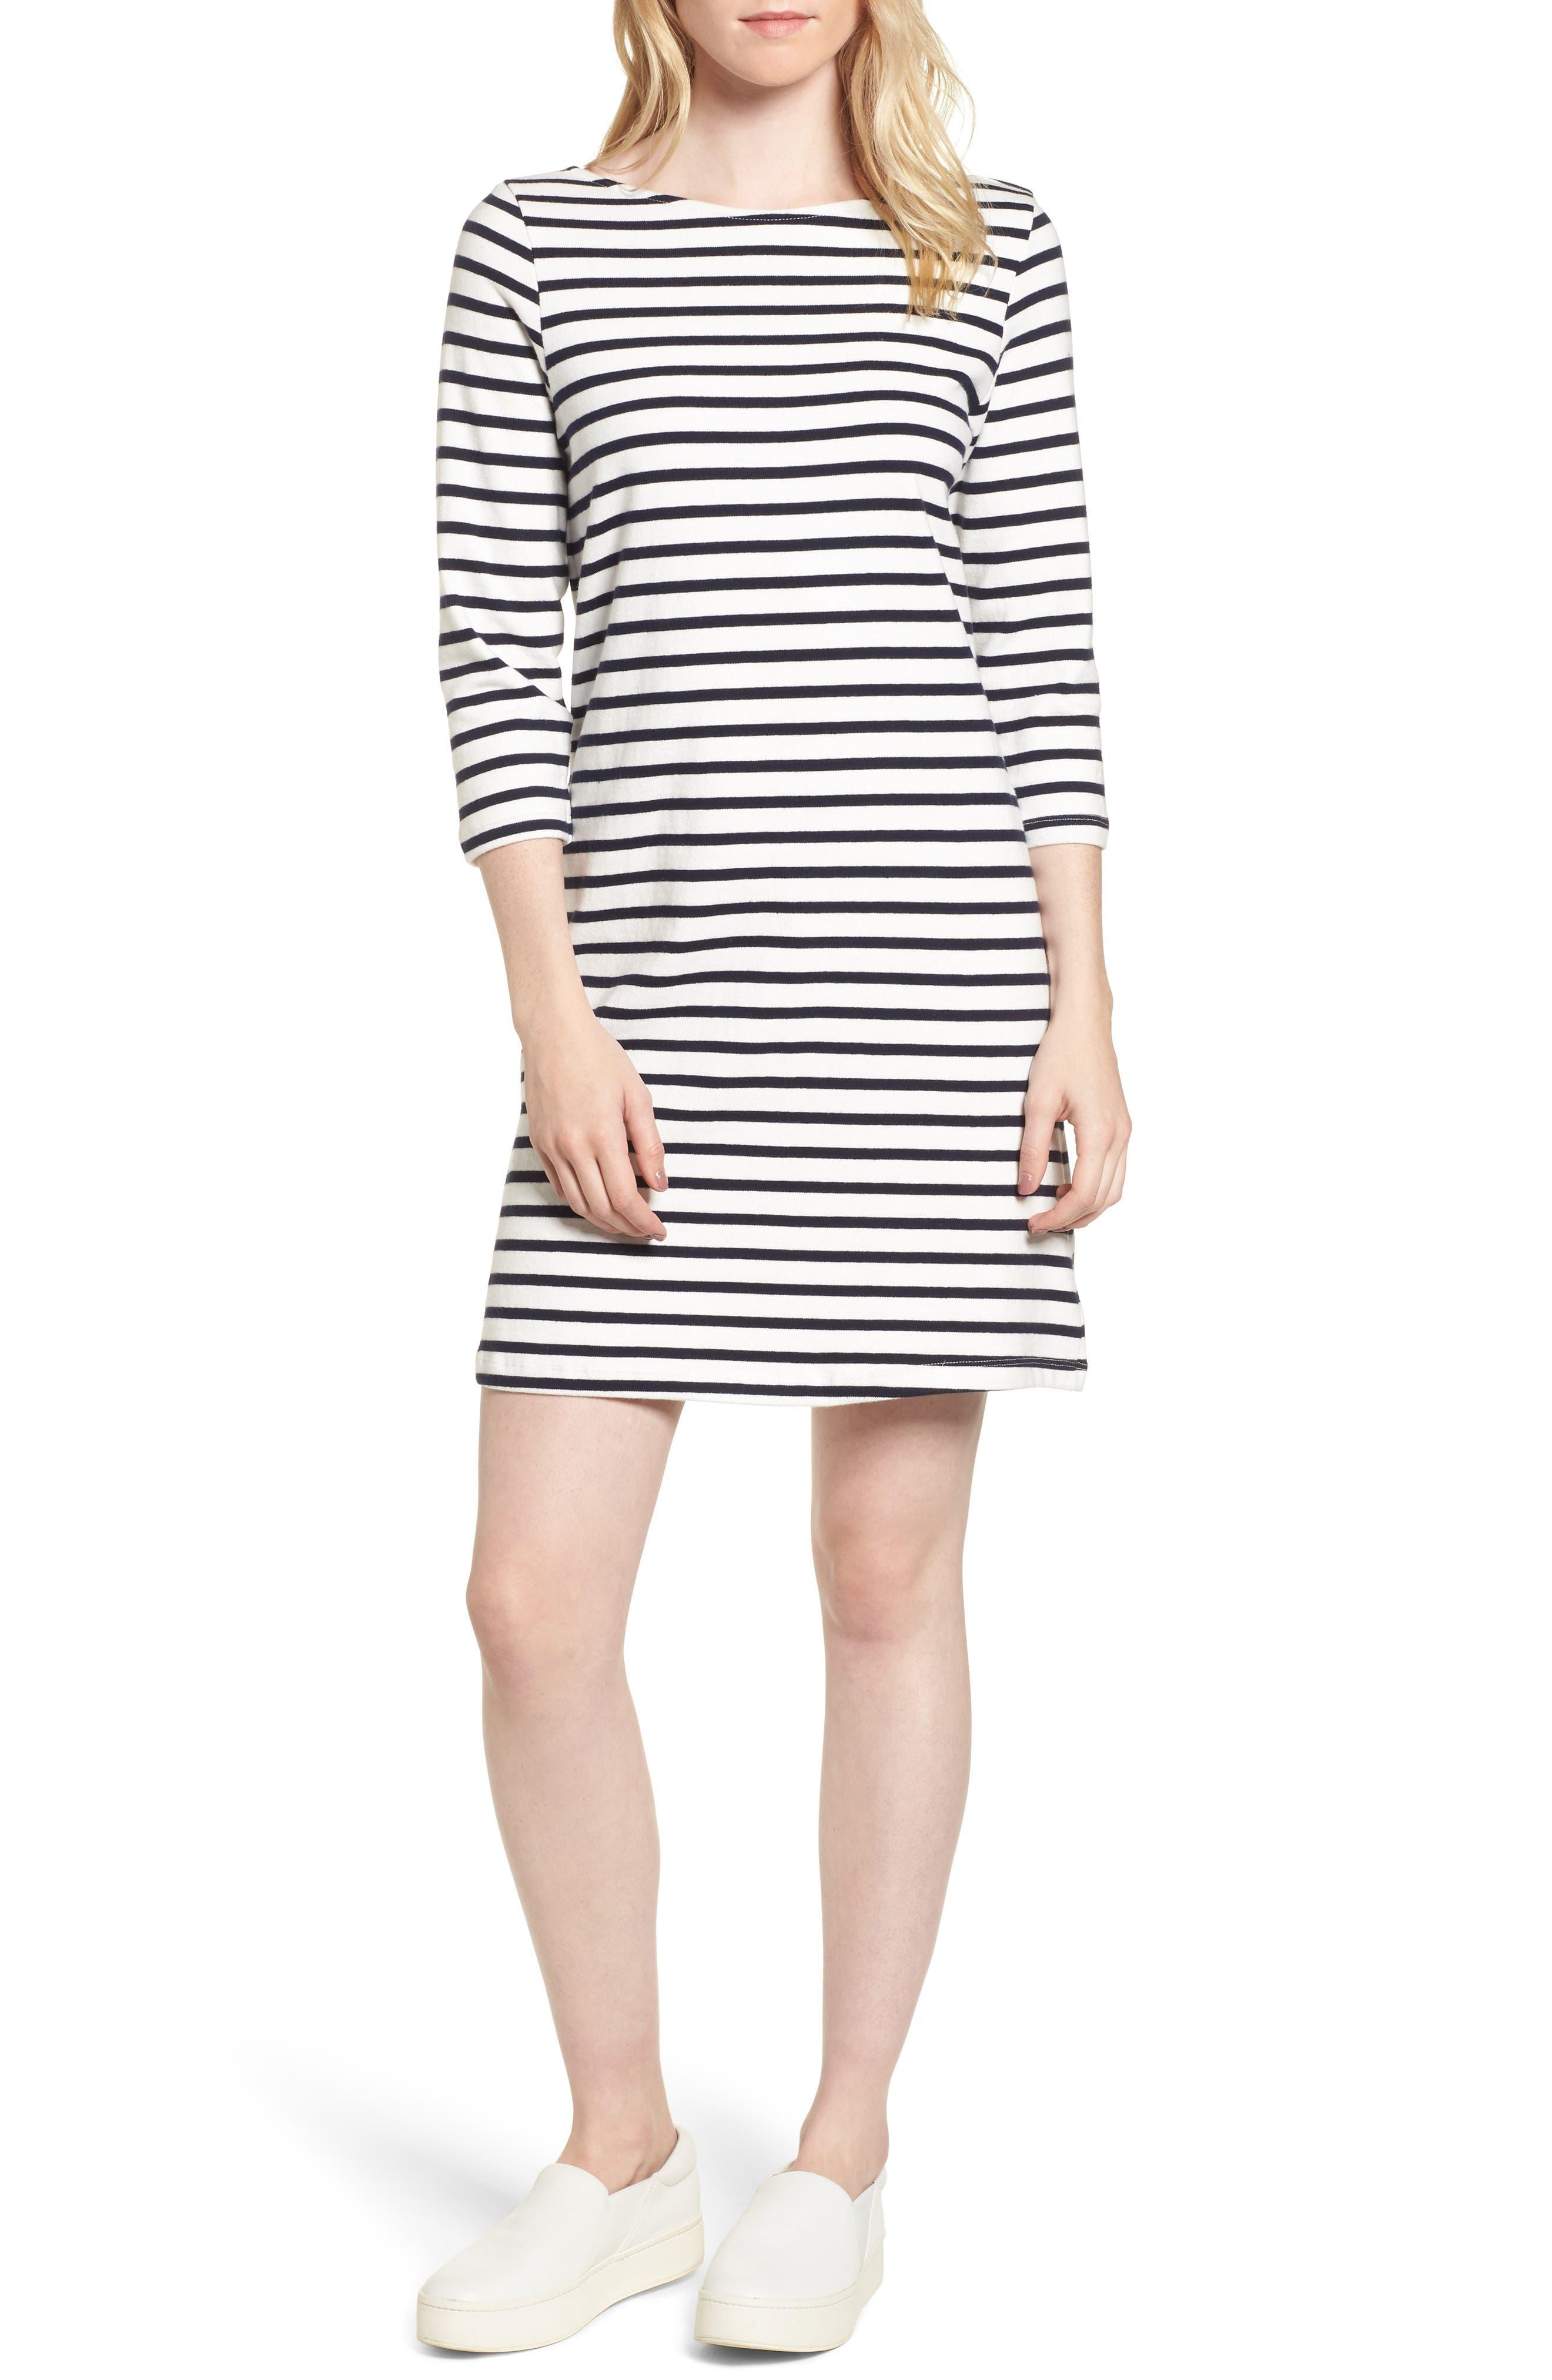 Main Image - Amour Vert Trista Organic Cotton Dress